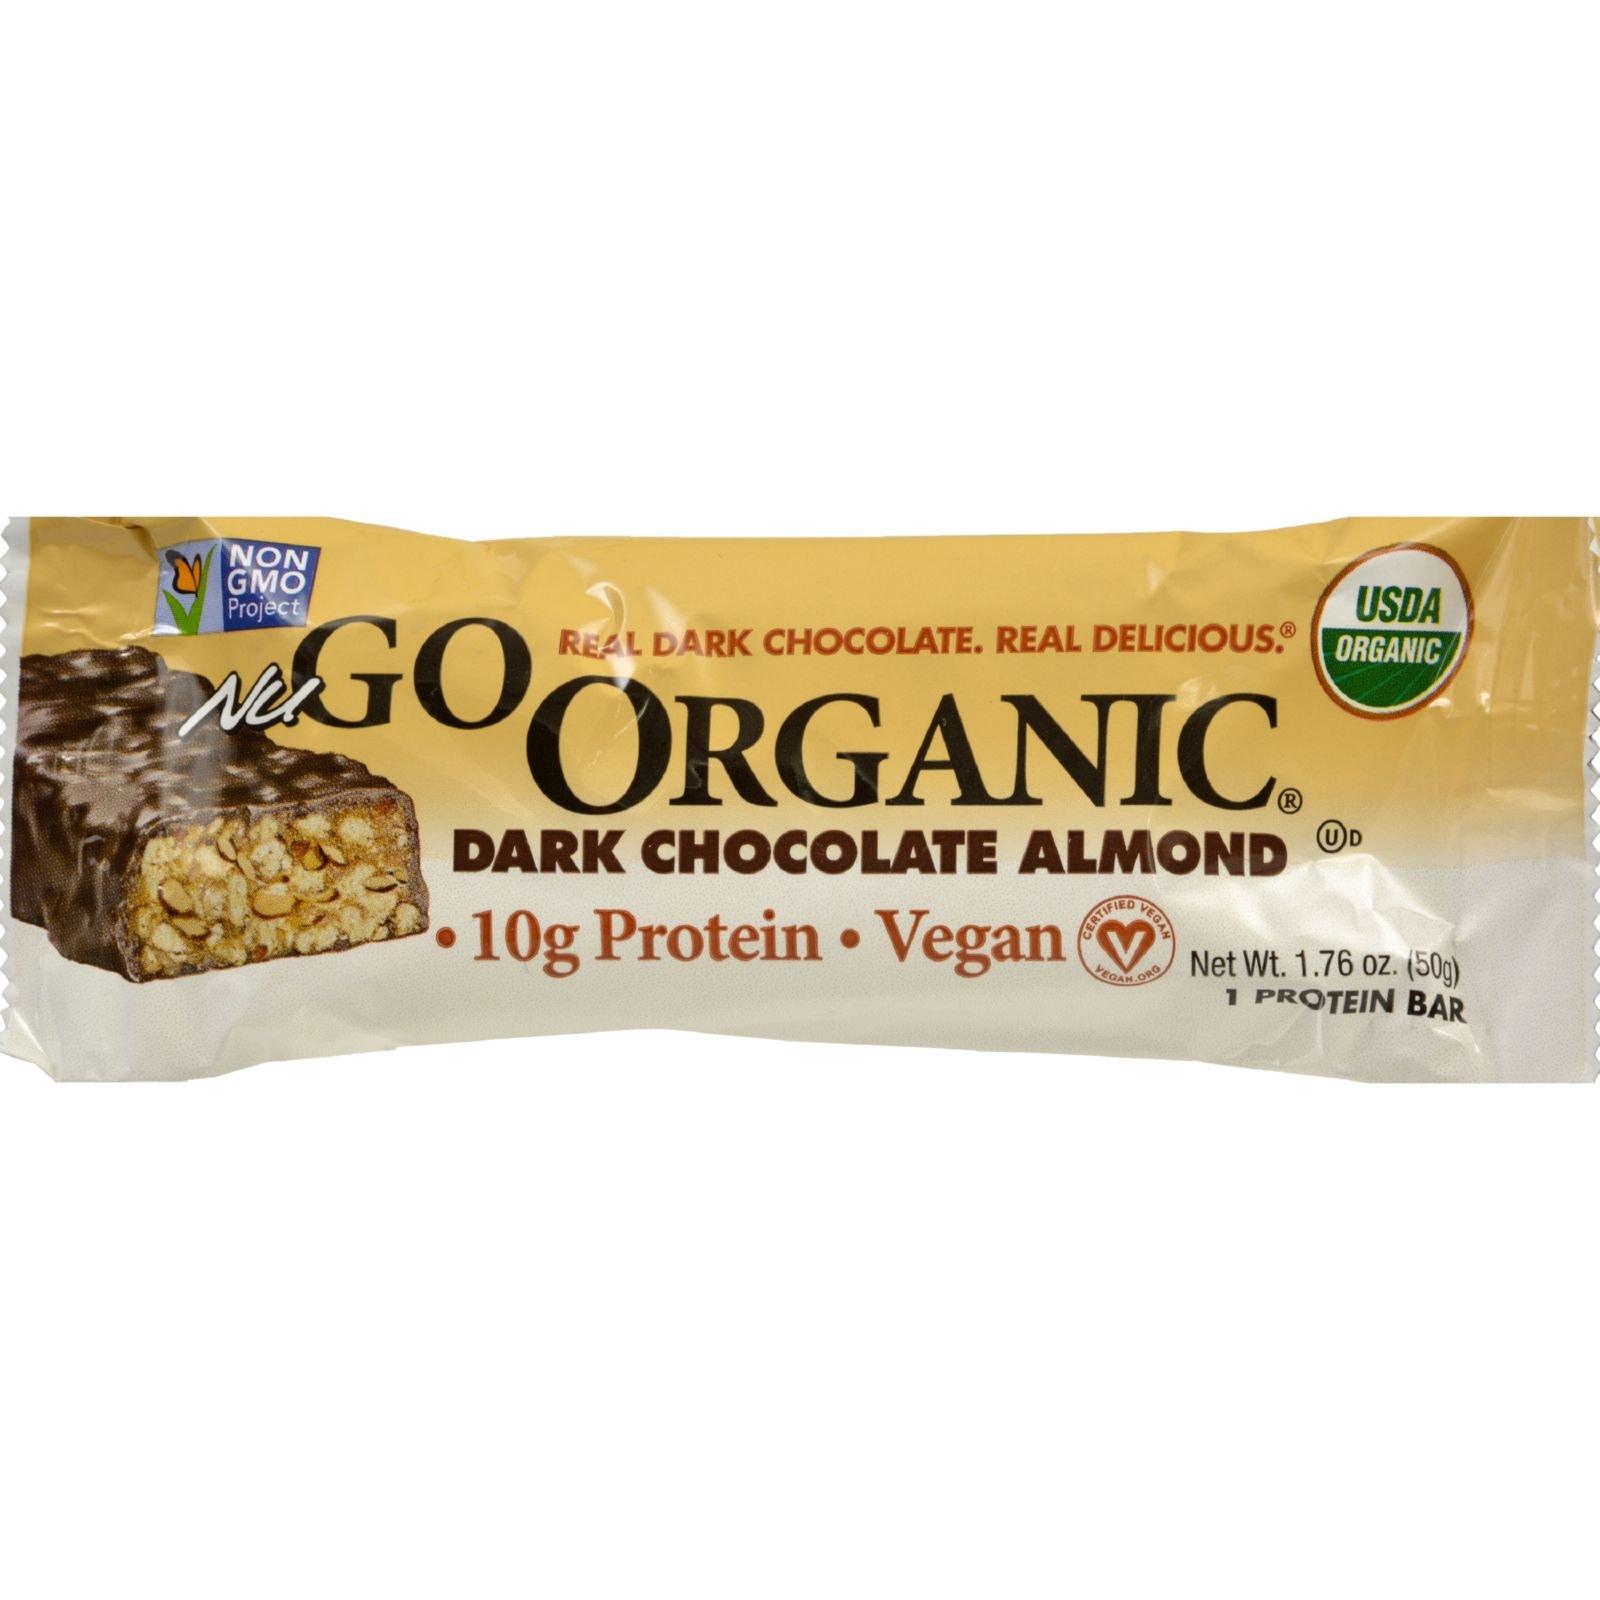 NuGO Nutrition Bar - Organic Dark Chocolate Almond - 1.76 oz - Case of 12